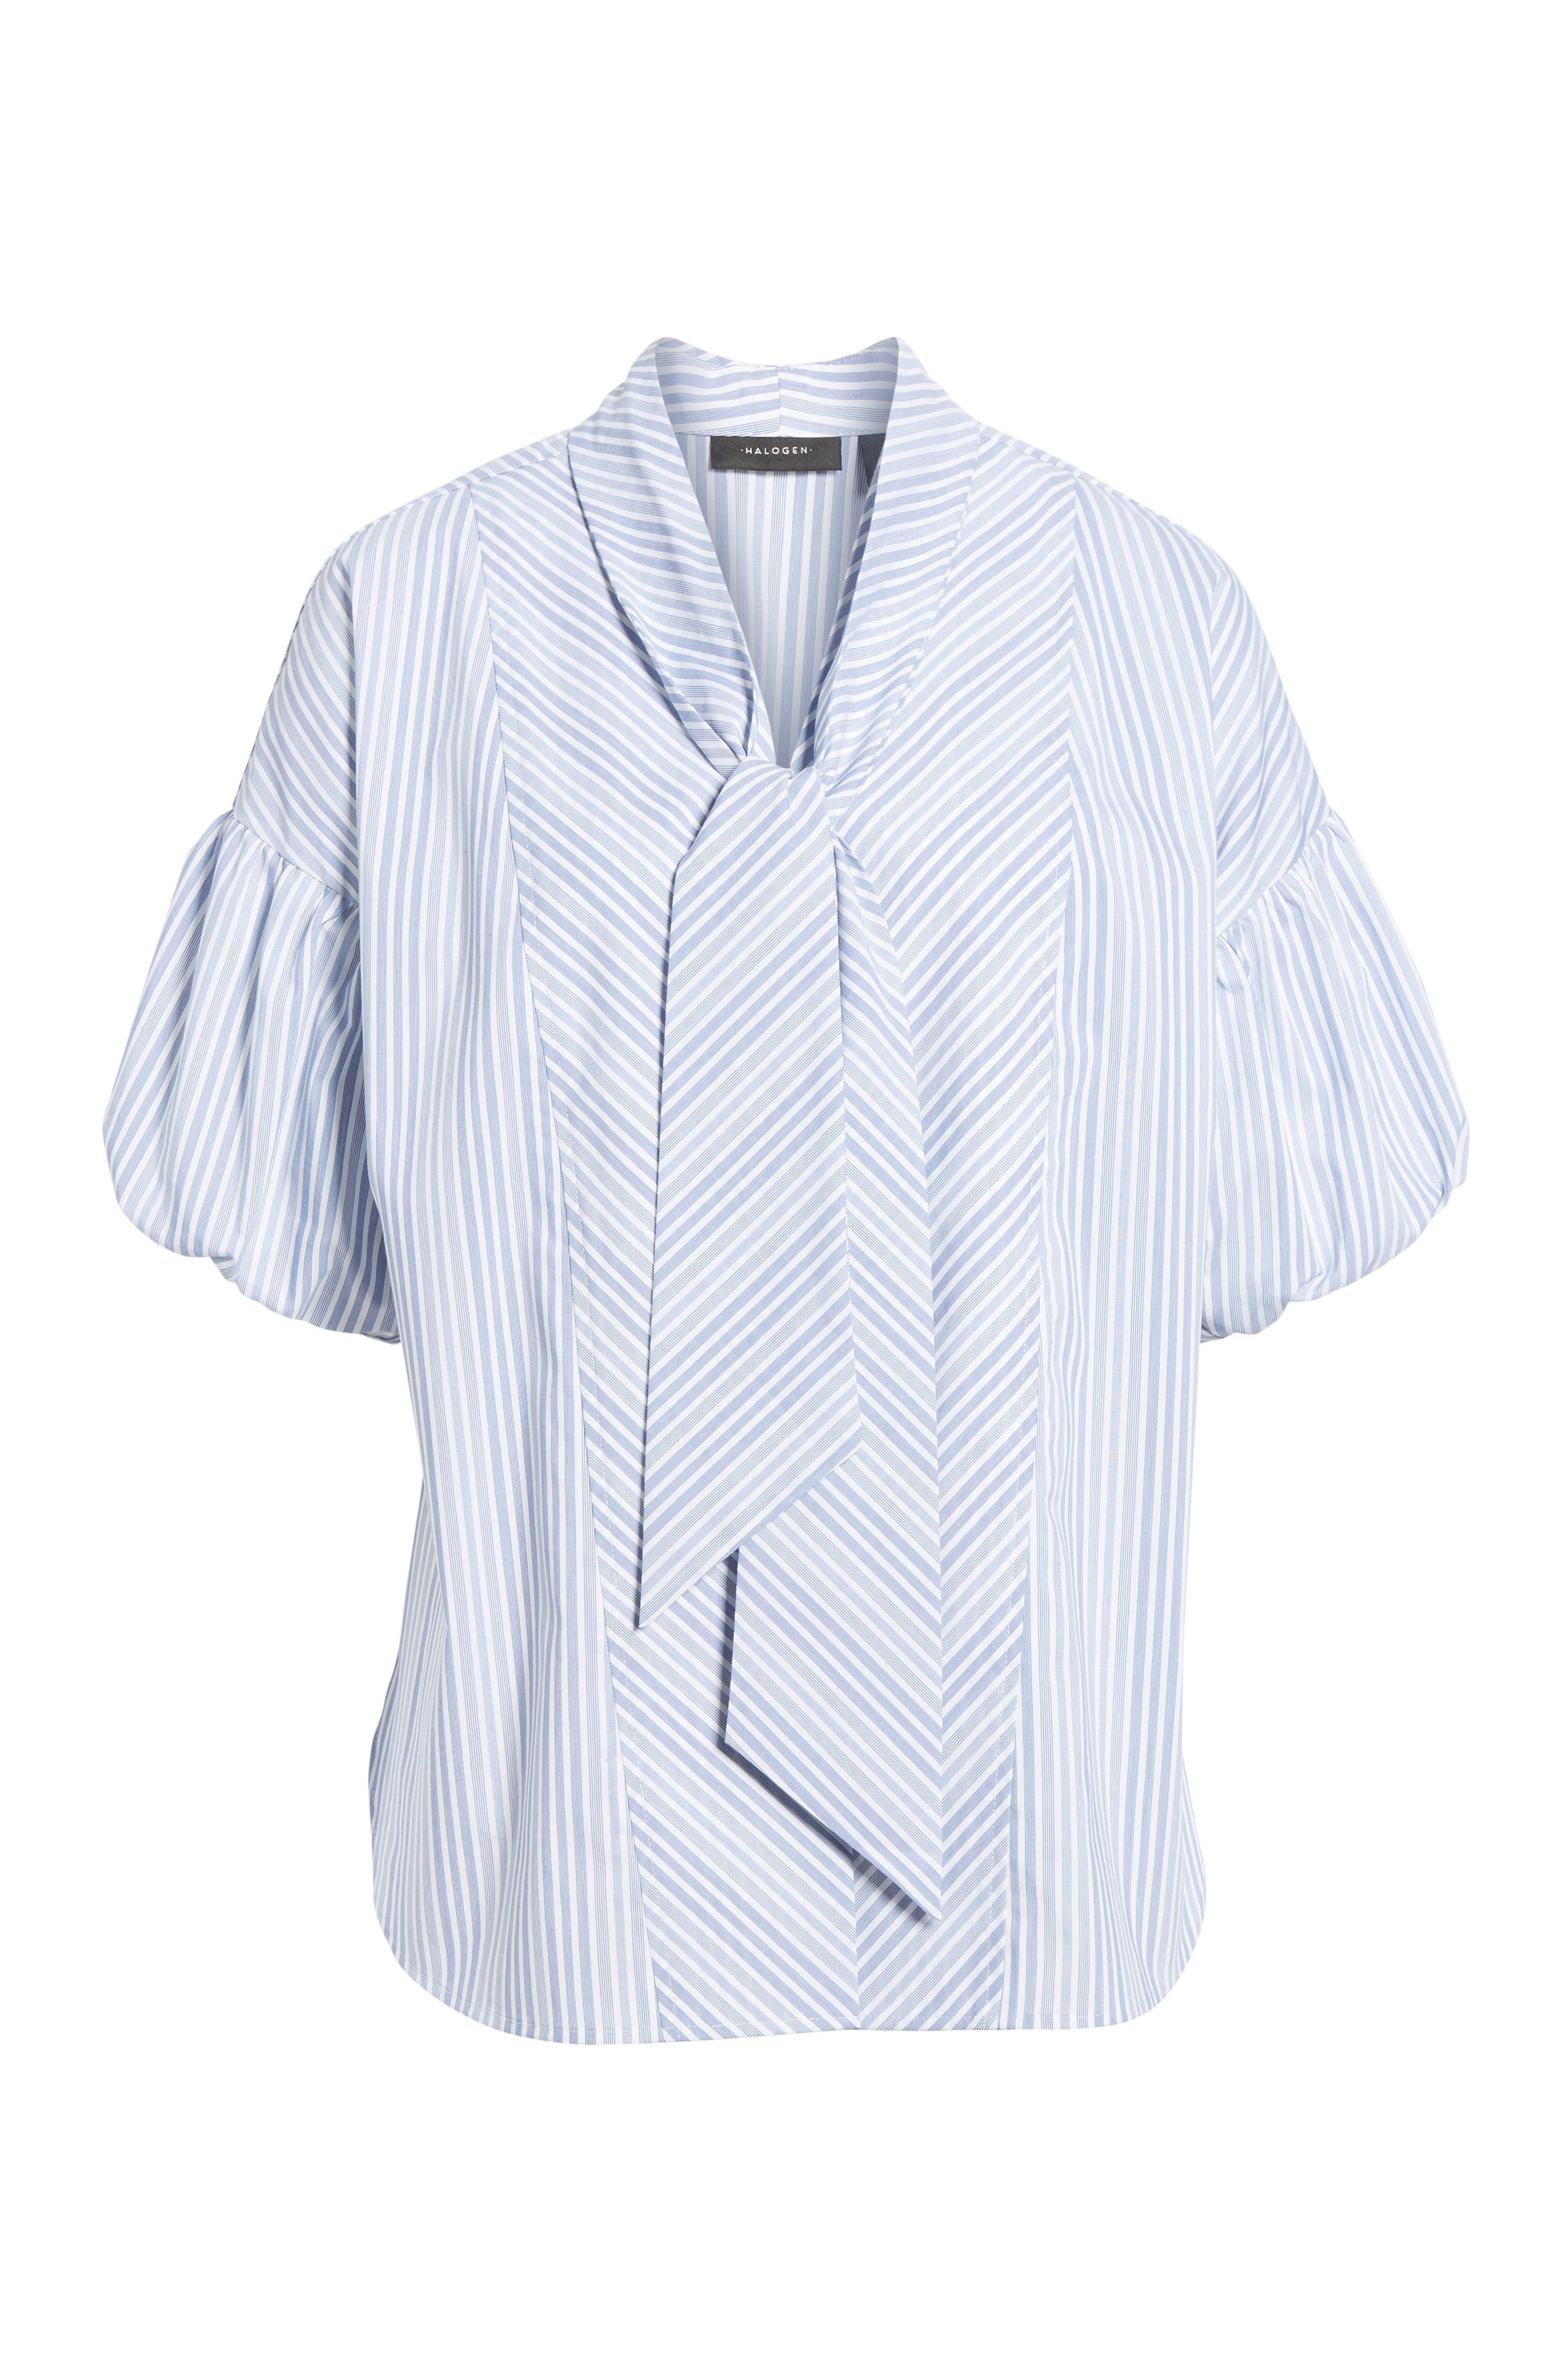 Tie Front Short Sleeve Blouse,                             Alternate thumbnail 7, color,                             Blue- White Stripe